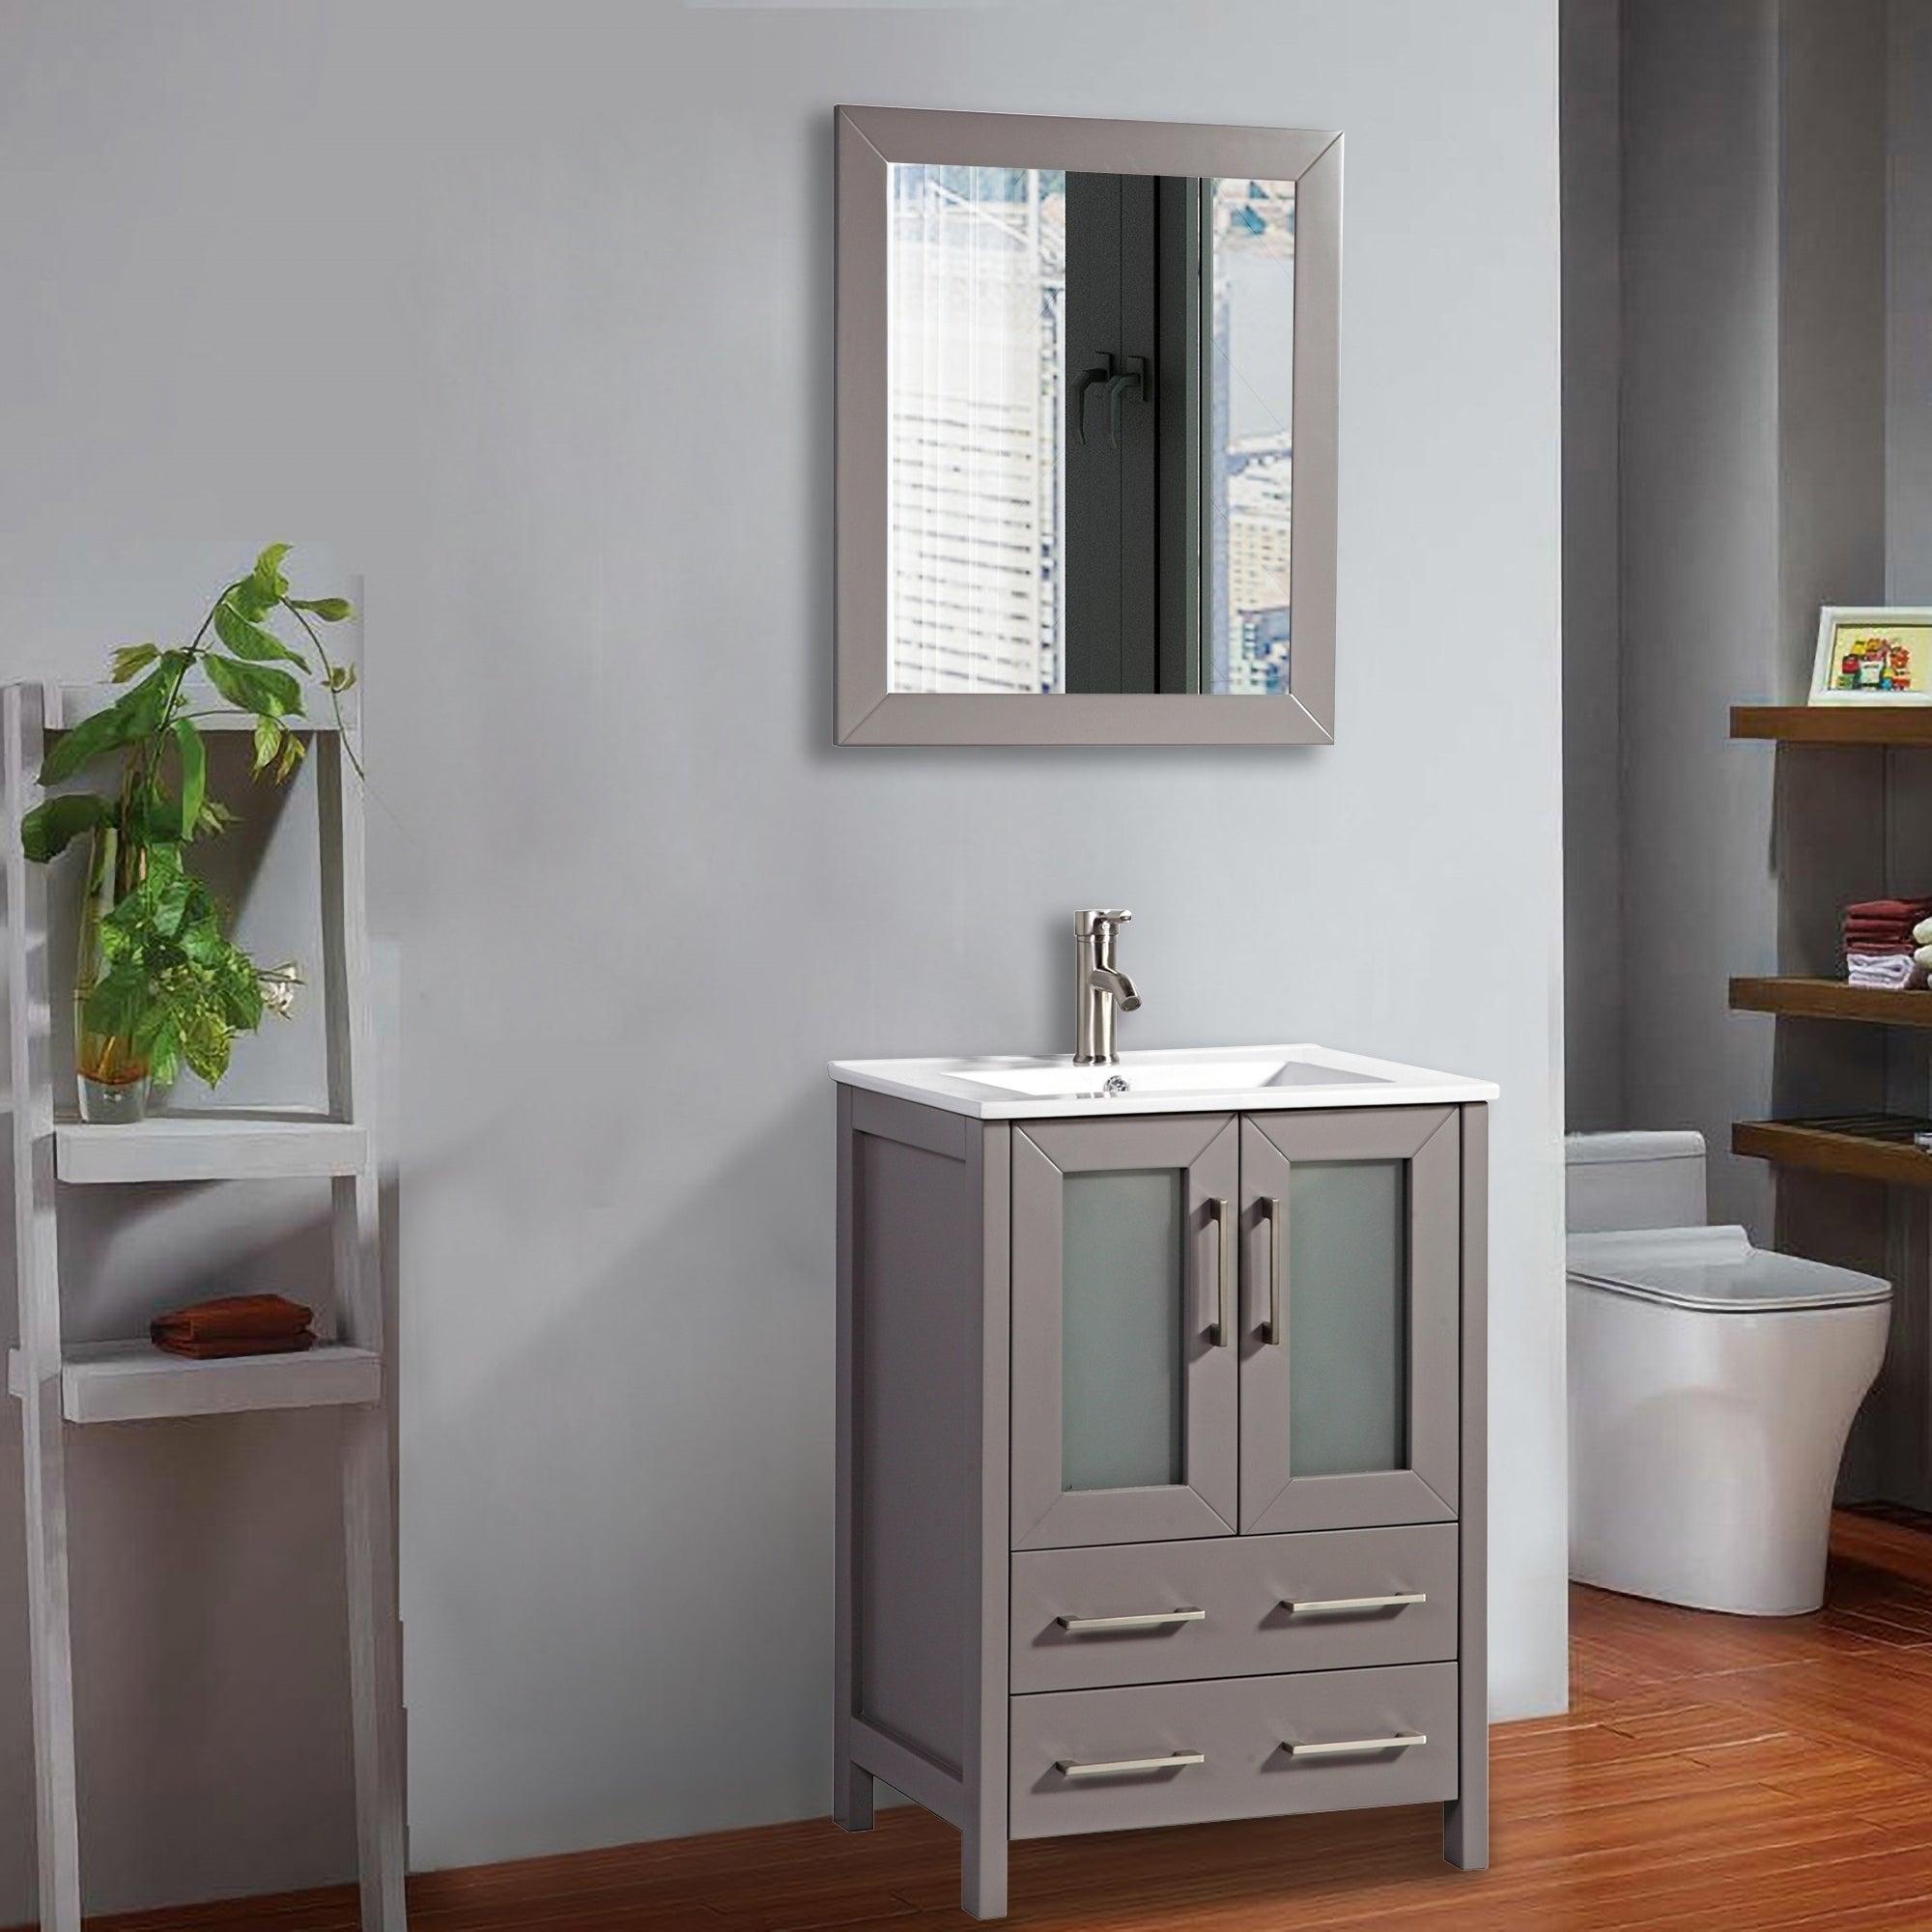 Vanity Art 24 Inch Single Sink Bathroom Set 2 Drawers 1 Cabinet Shelf Soft Closing Doors With Free Mirror